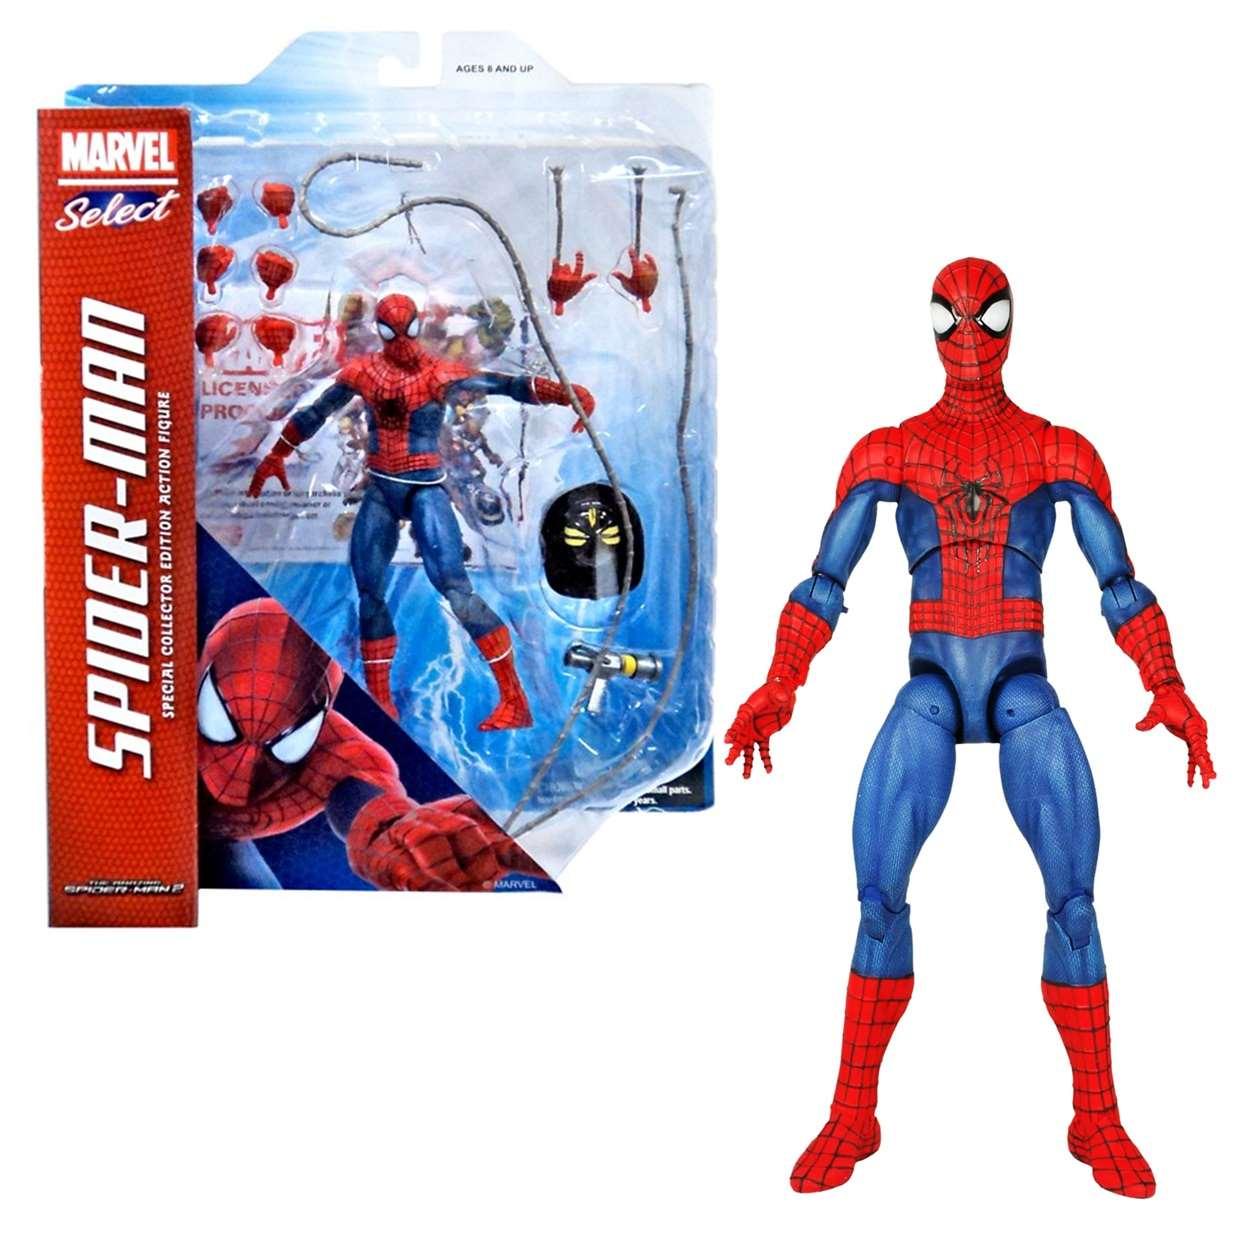 The Amazing Spider Man 2 Movie Figura Disney Marvel Select